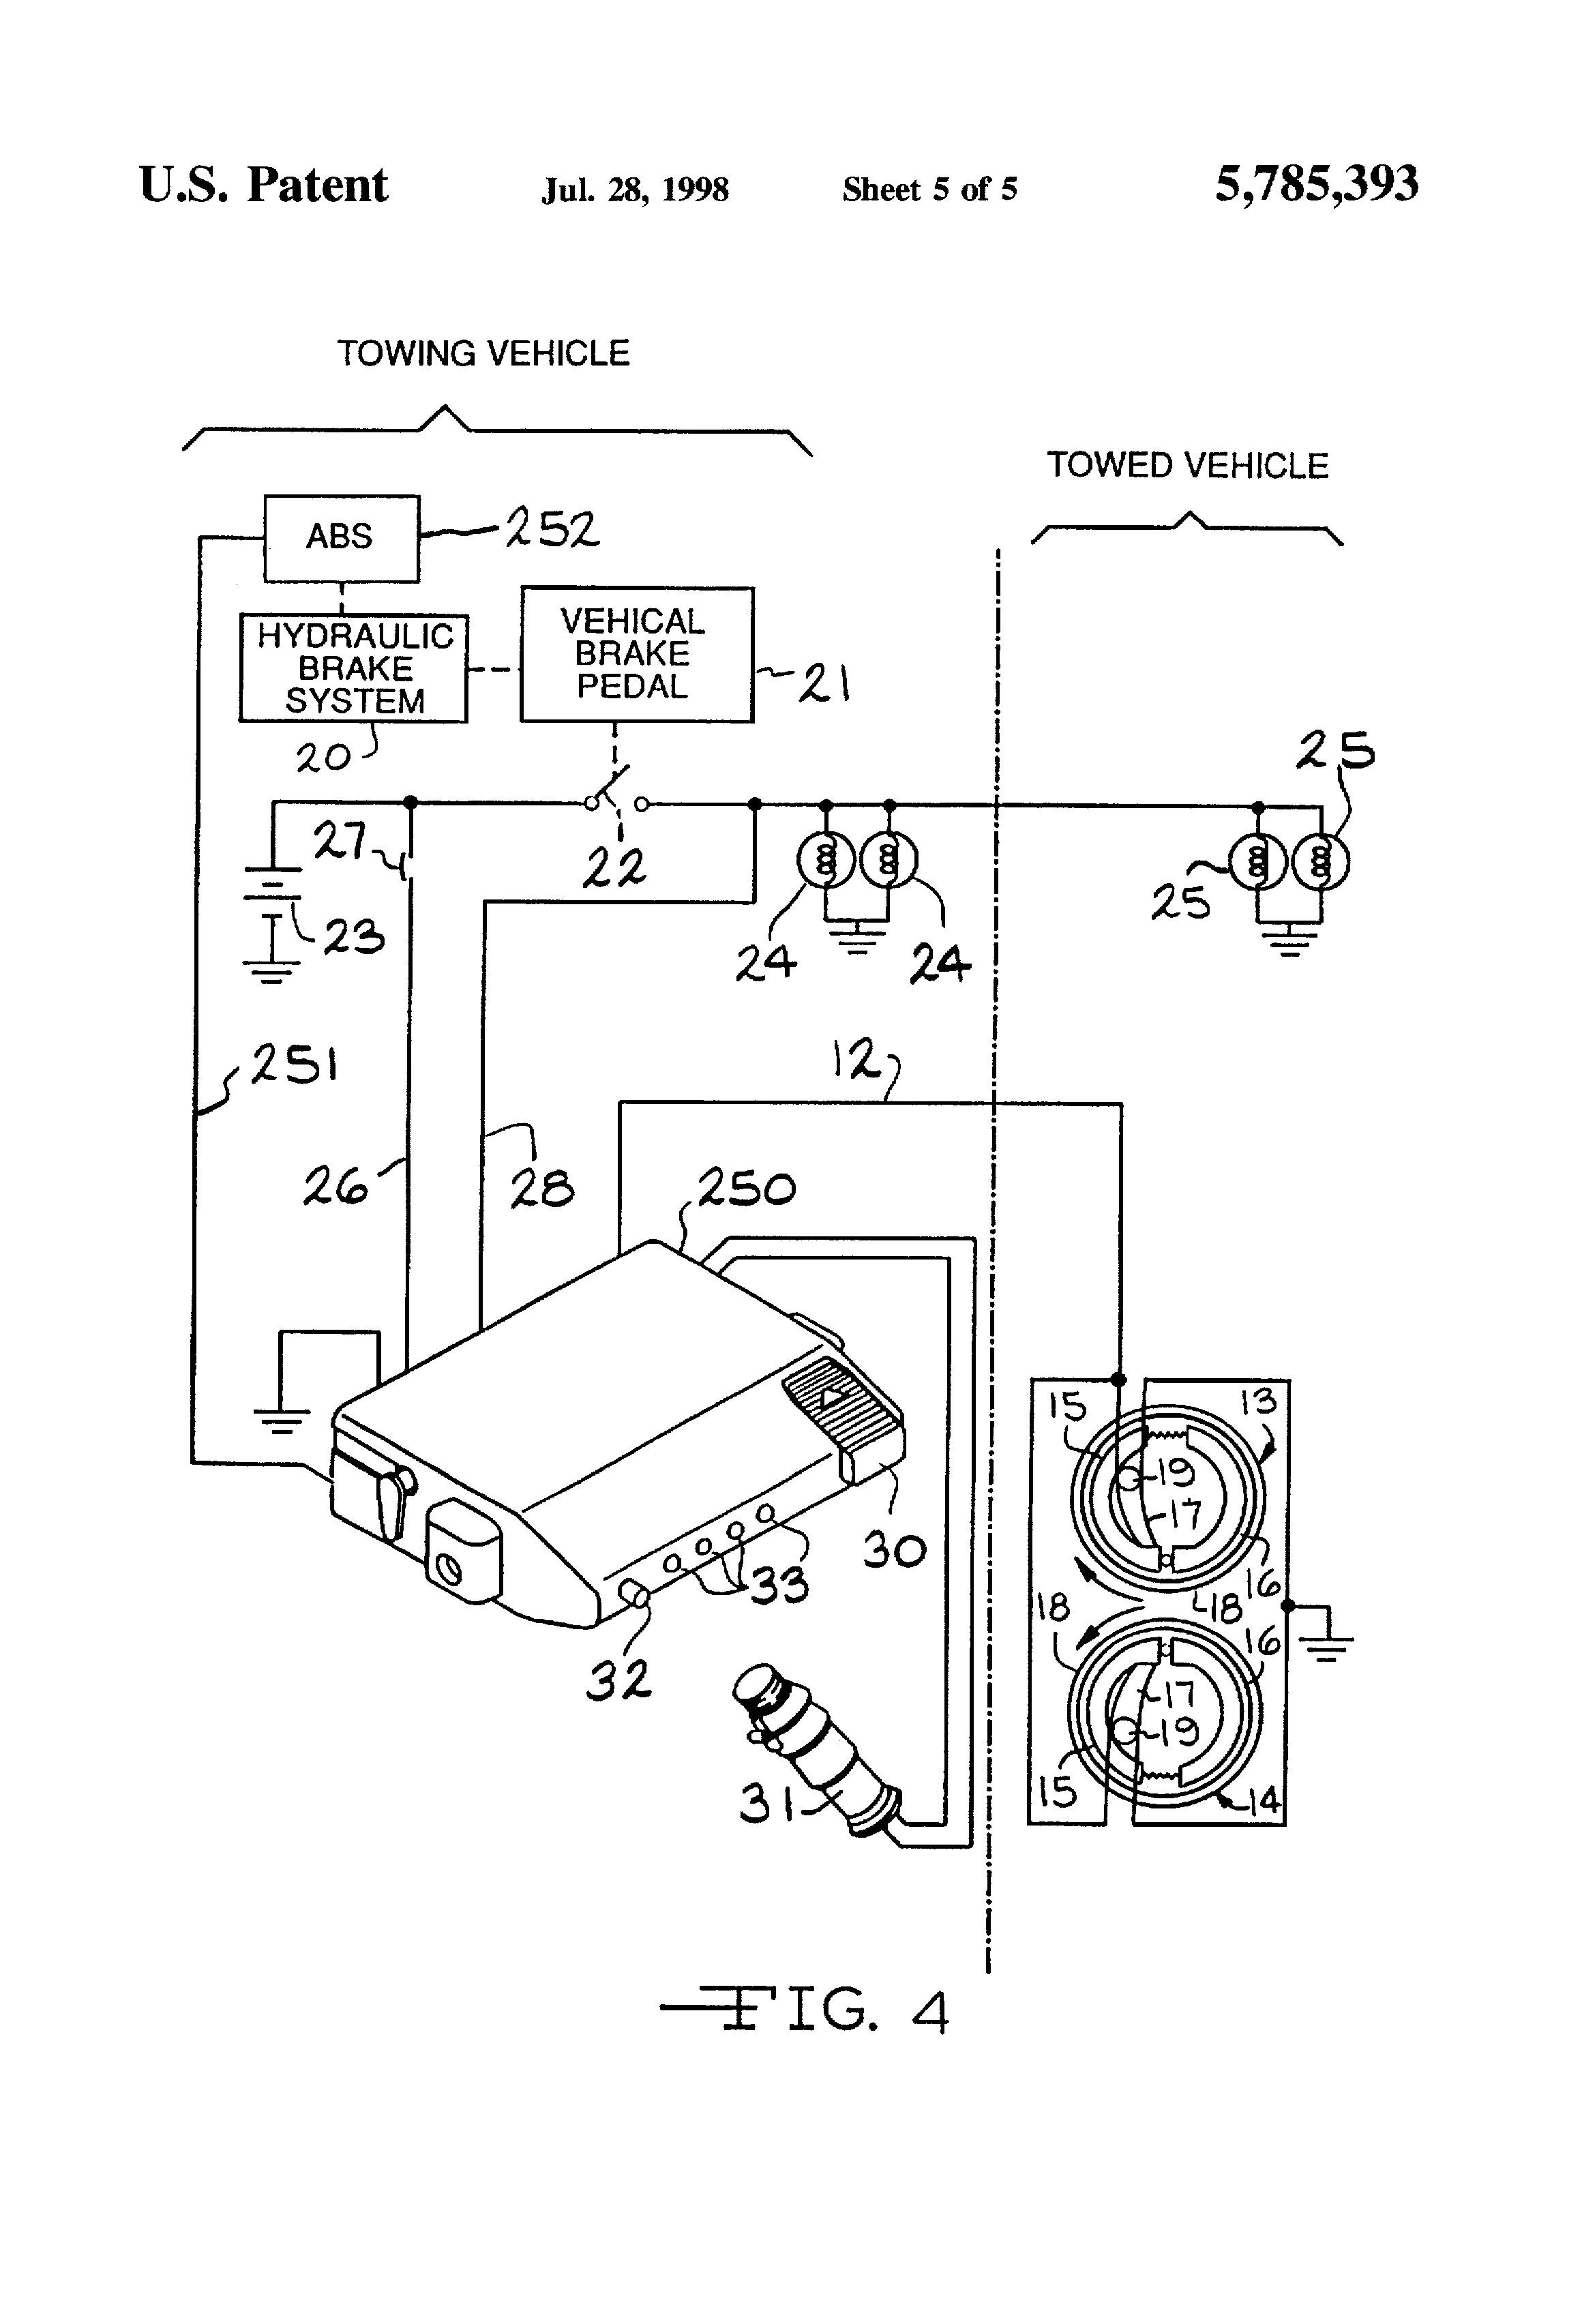 Trailer Breakaway Kit Wiring Diagram Electric Brake Controller Wiring Diagram Wiring Diagram Of Trailer Breakaway Kit Wiring Diagram